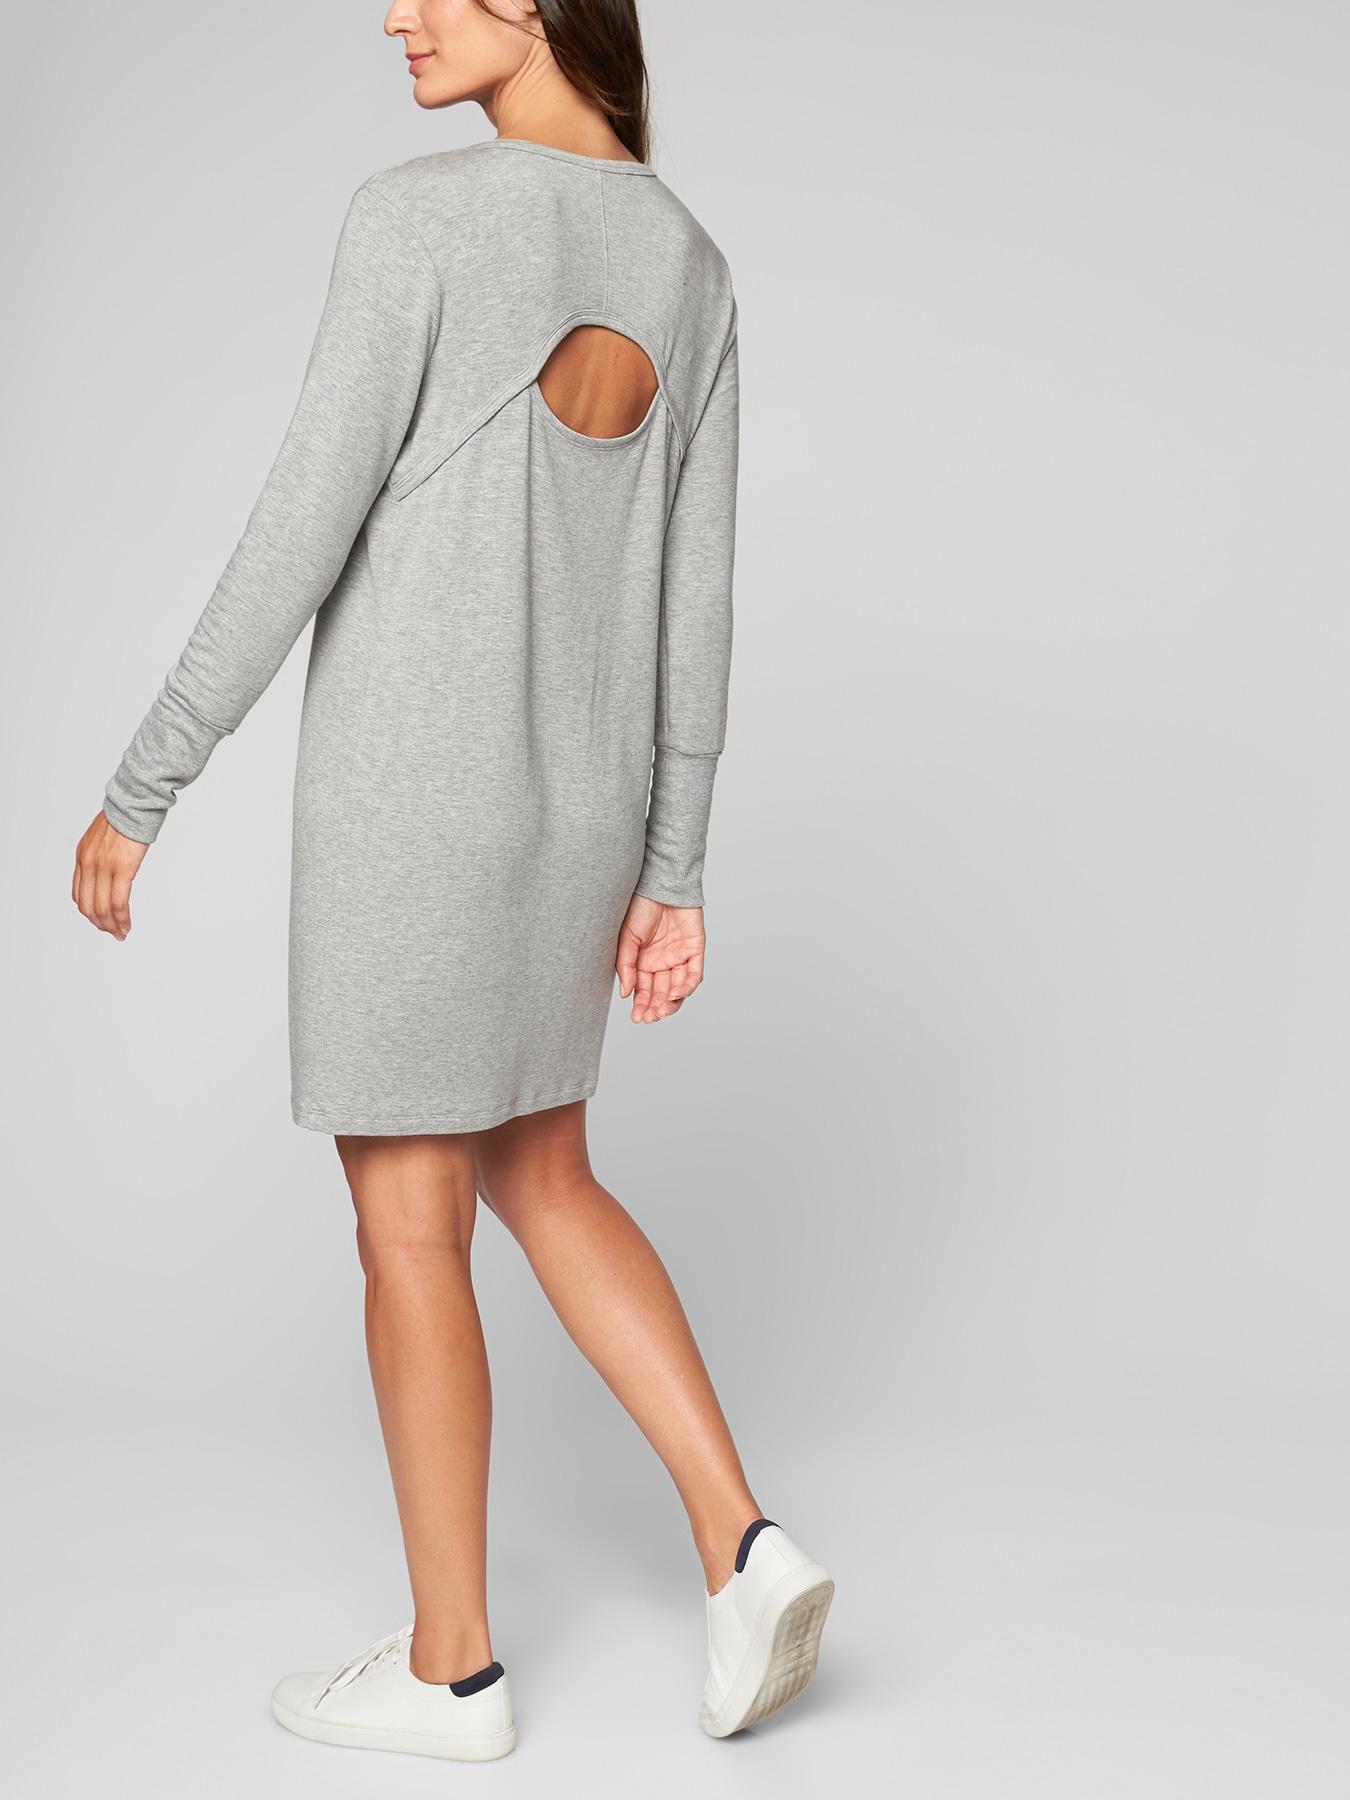 4596895cdf0 Lyst - Athleta Crossover Sweatshirt Dress in Gray